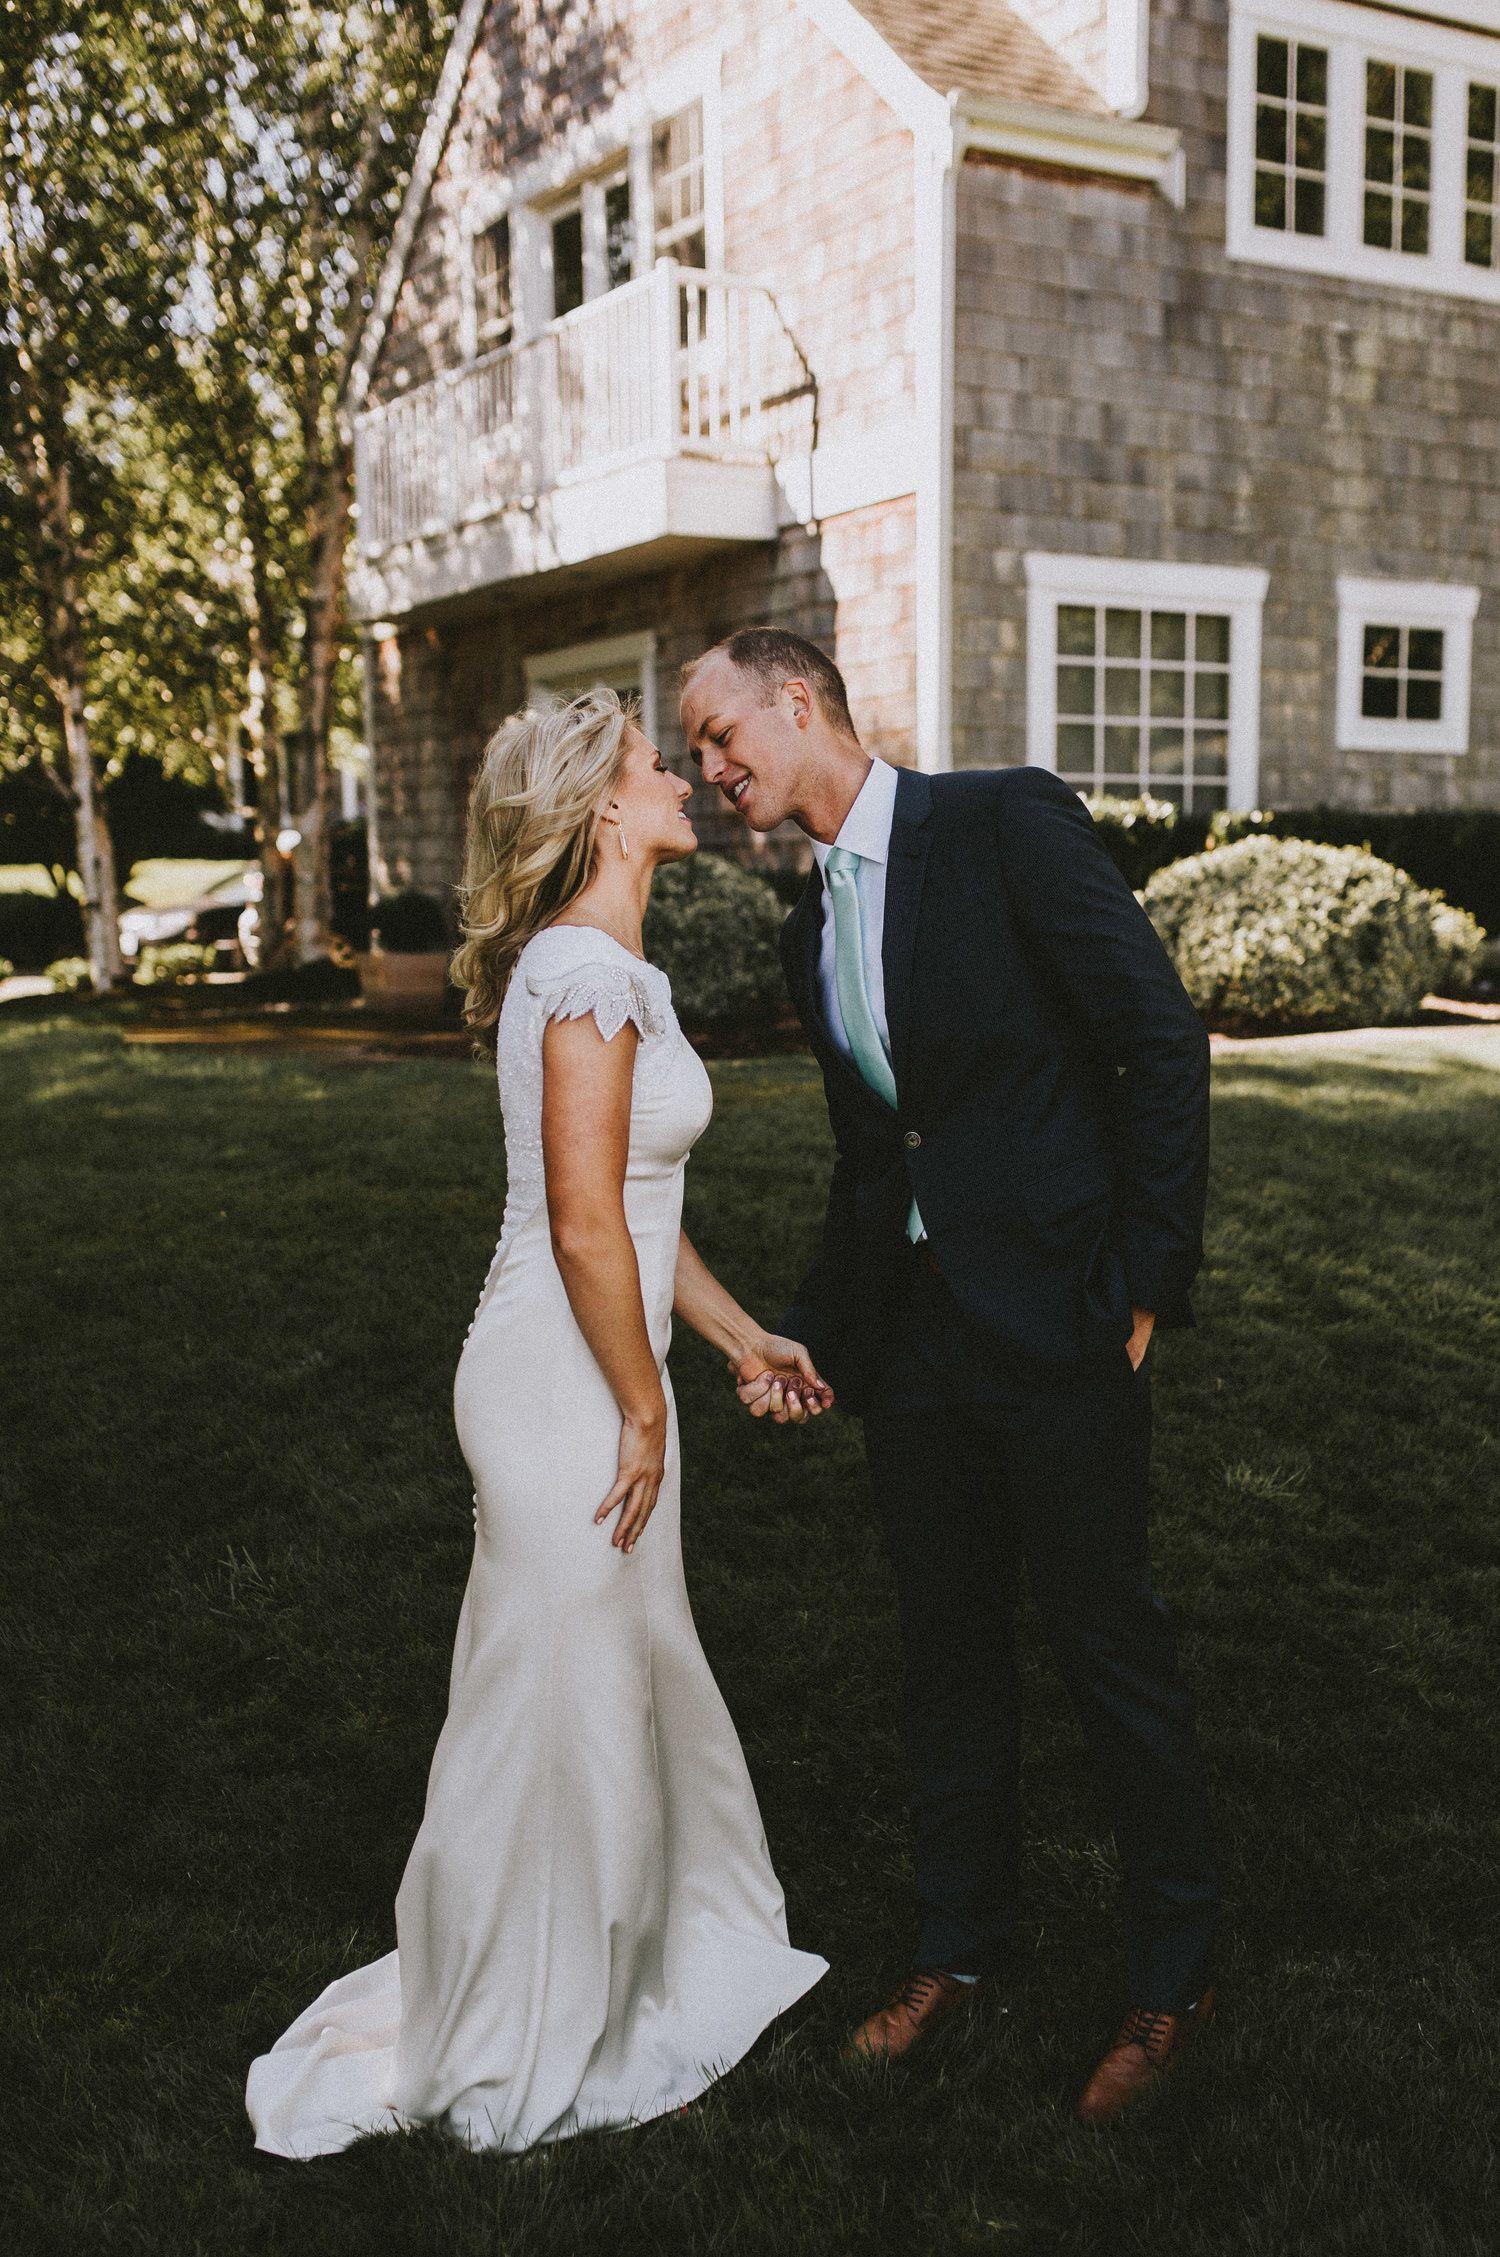 Samlandrethsrg wedding dress pinterest elopements